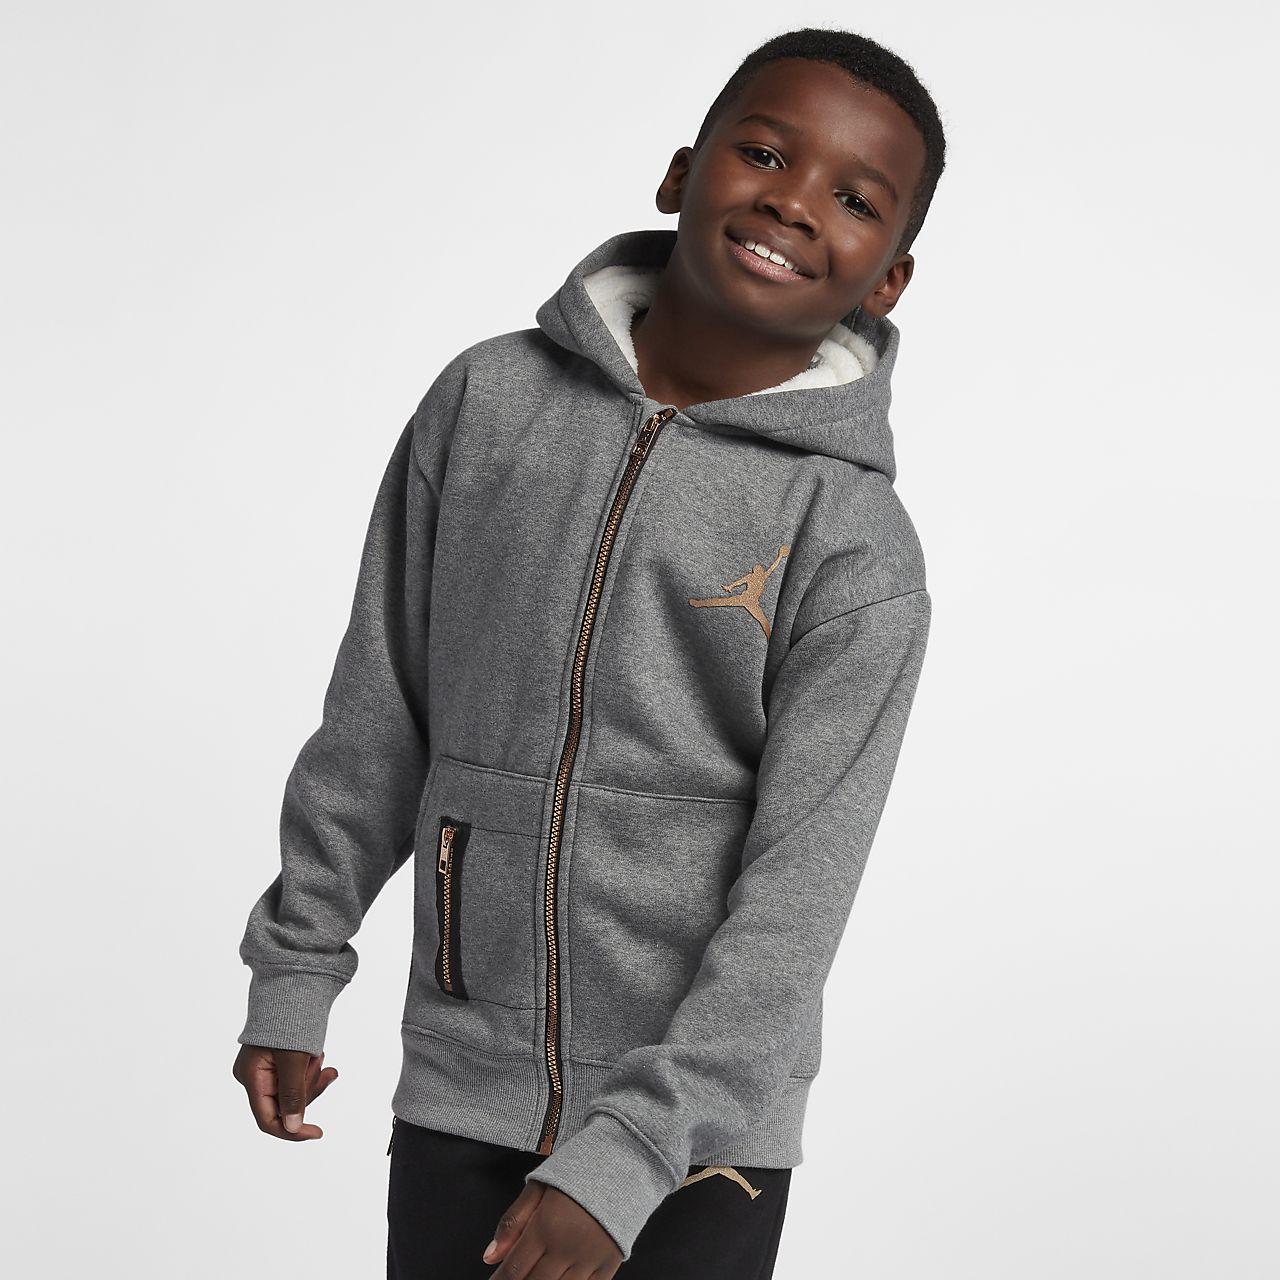 c2dc305e0e6 Jordan Big Kids' (Boys') Full-Zip Hoodie. Nike.com